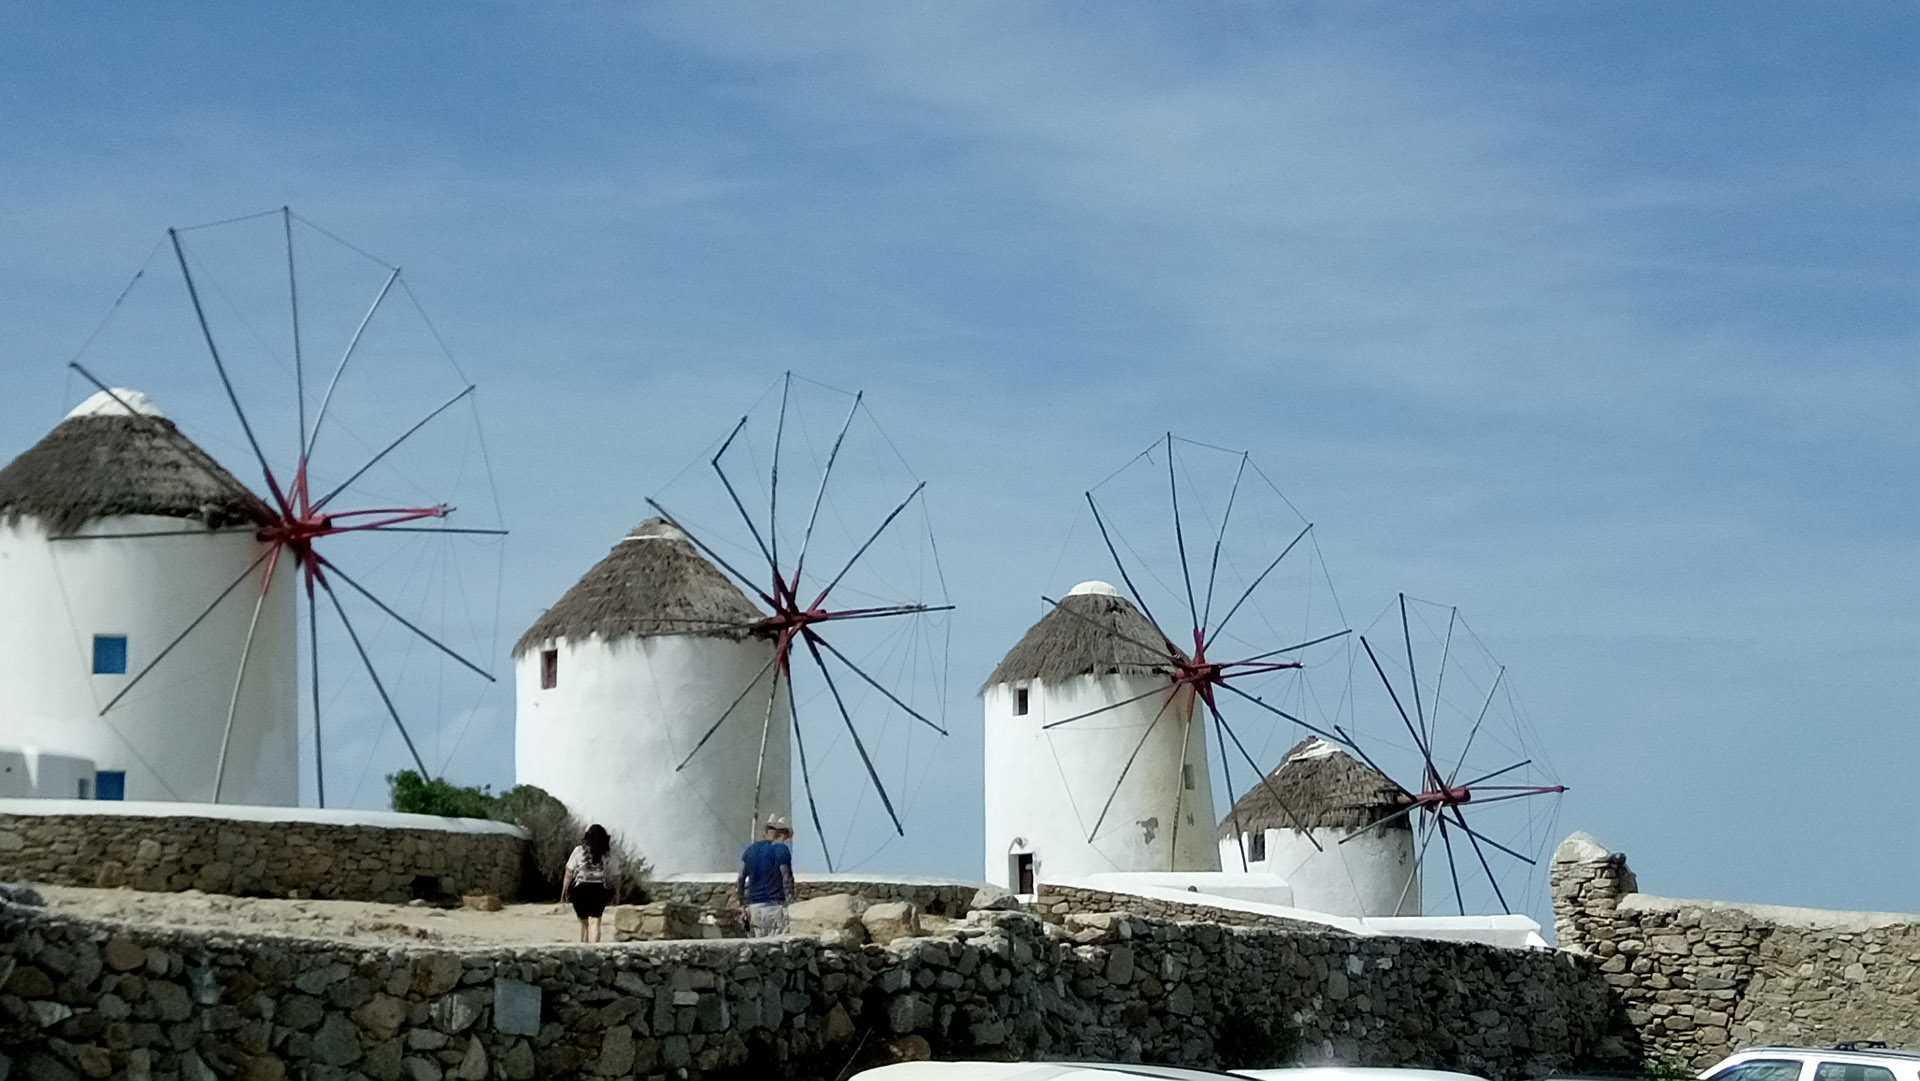 5. MARAVILHAS GREGAS 1 – Creta, Santorini e Mykonos – 12 dias // 11 noites